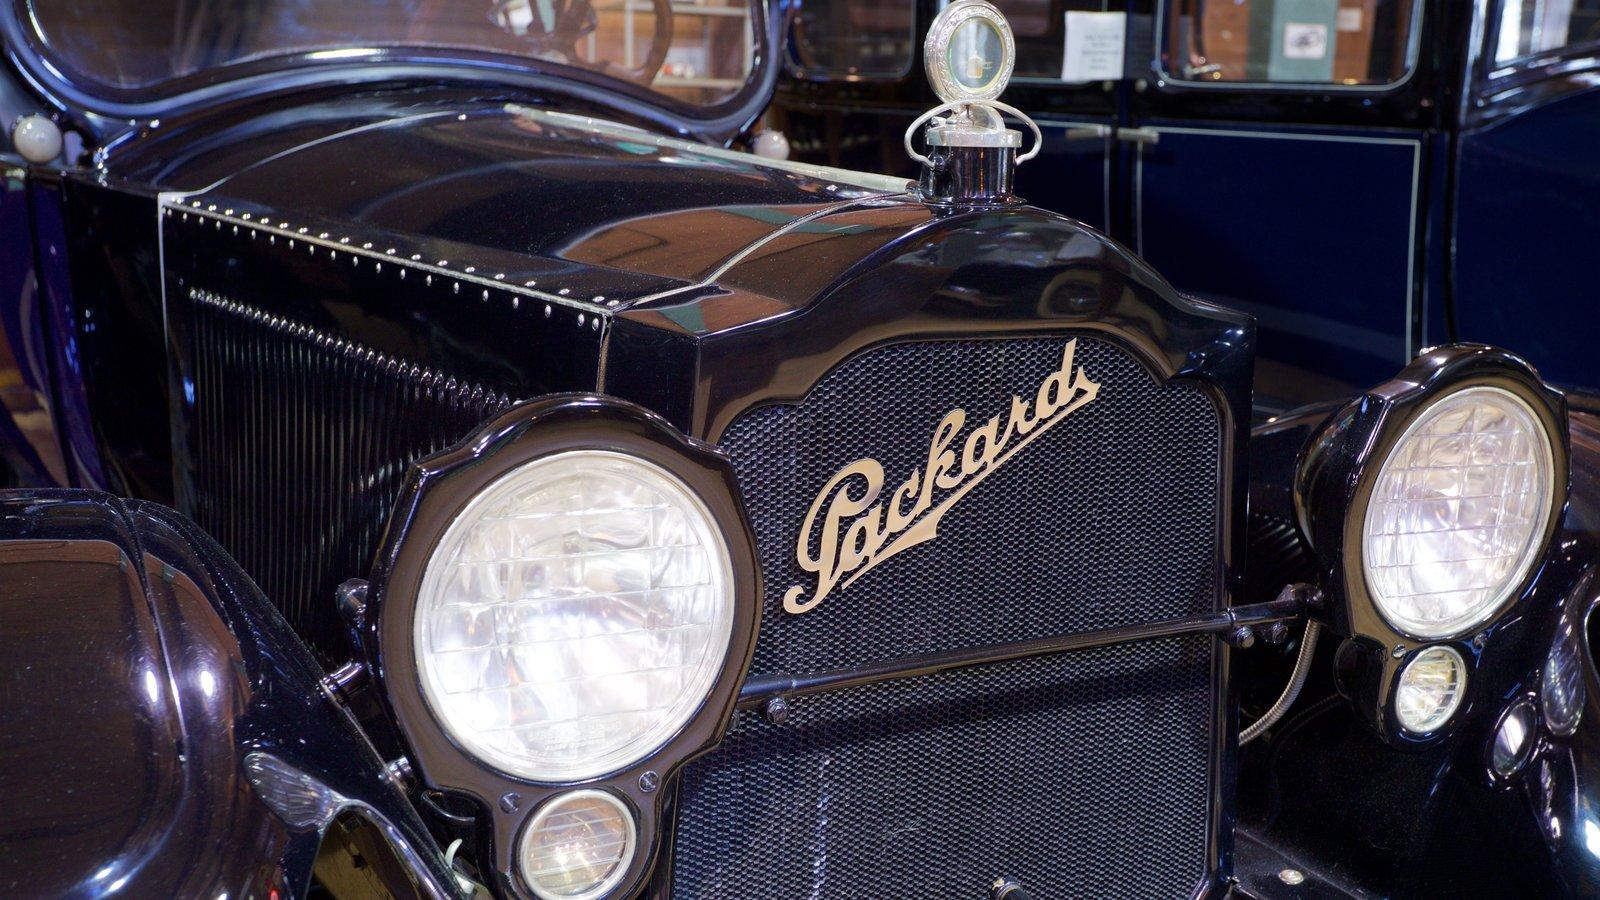 Fort Lauderdale Antique Car Museum caracterizando elementos de patrimônio